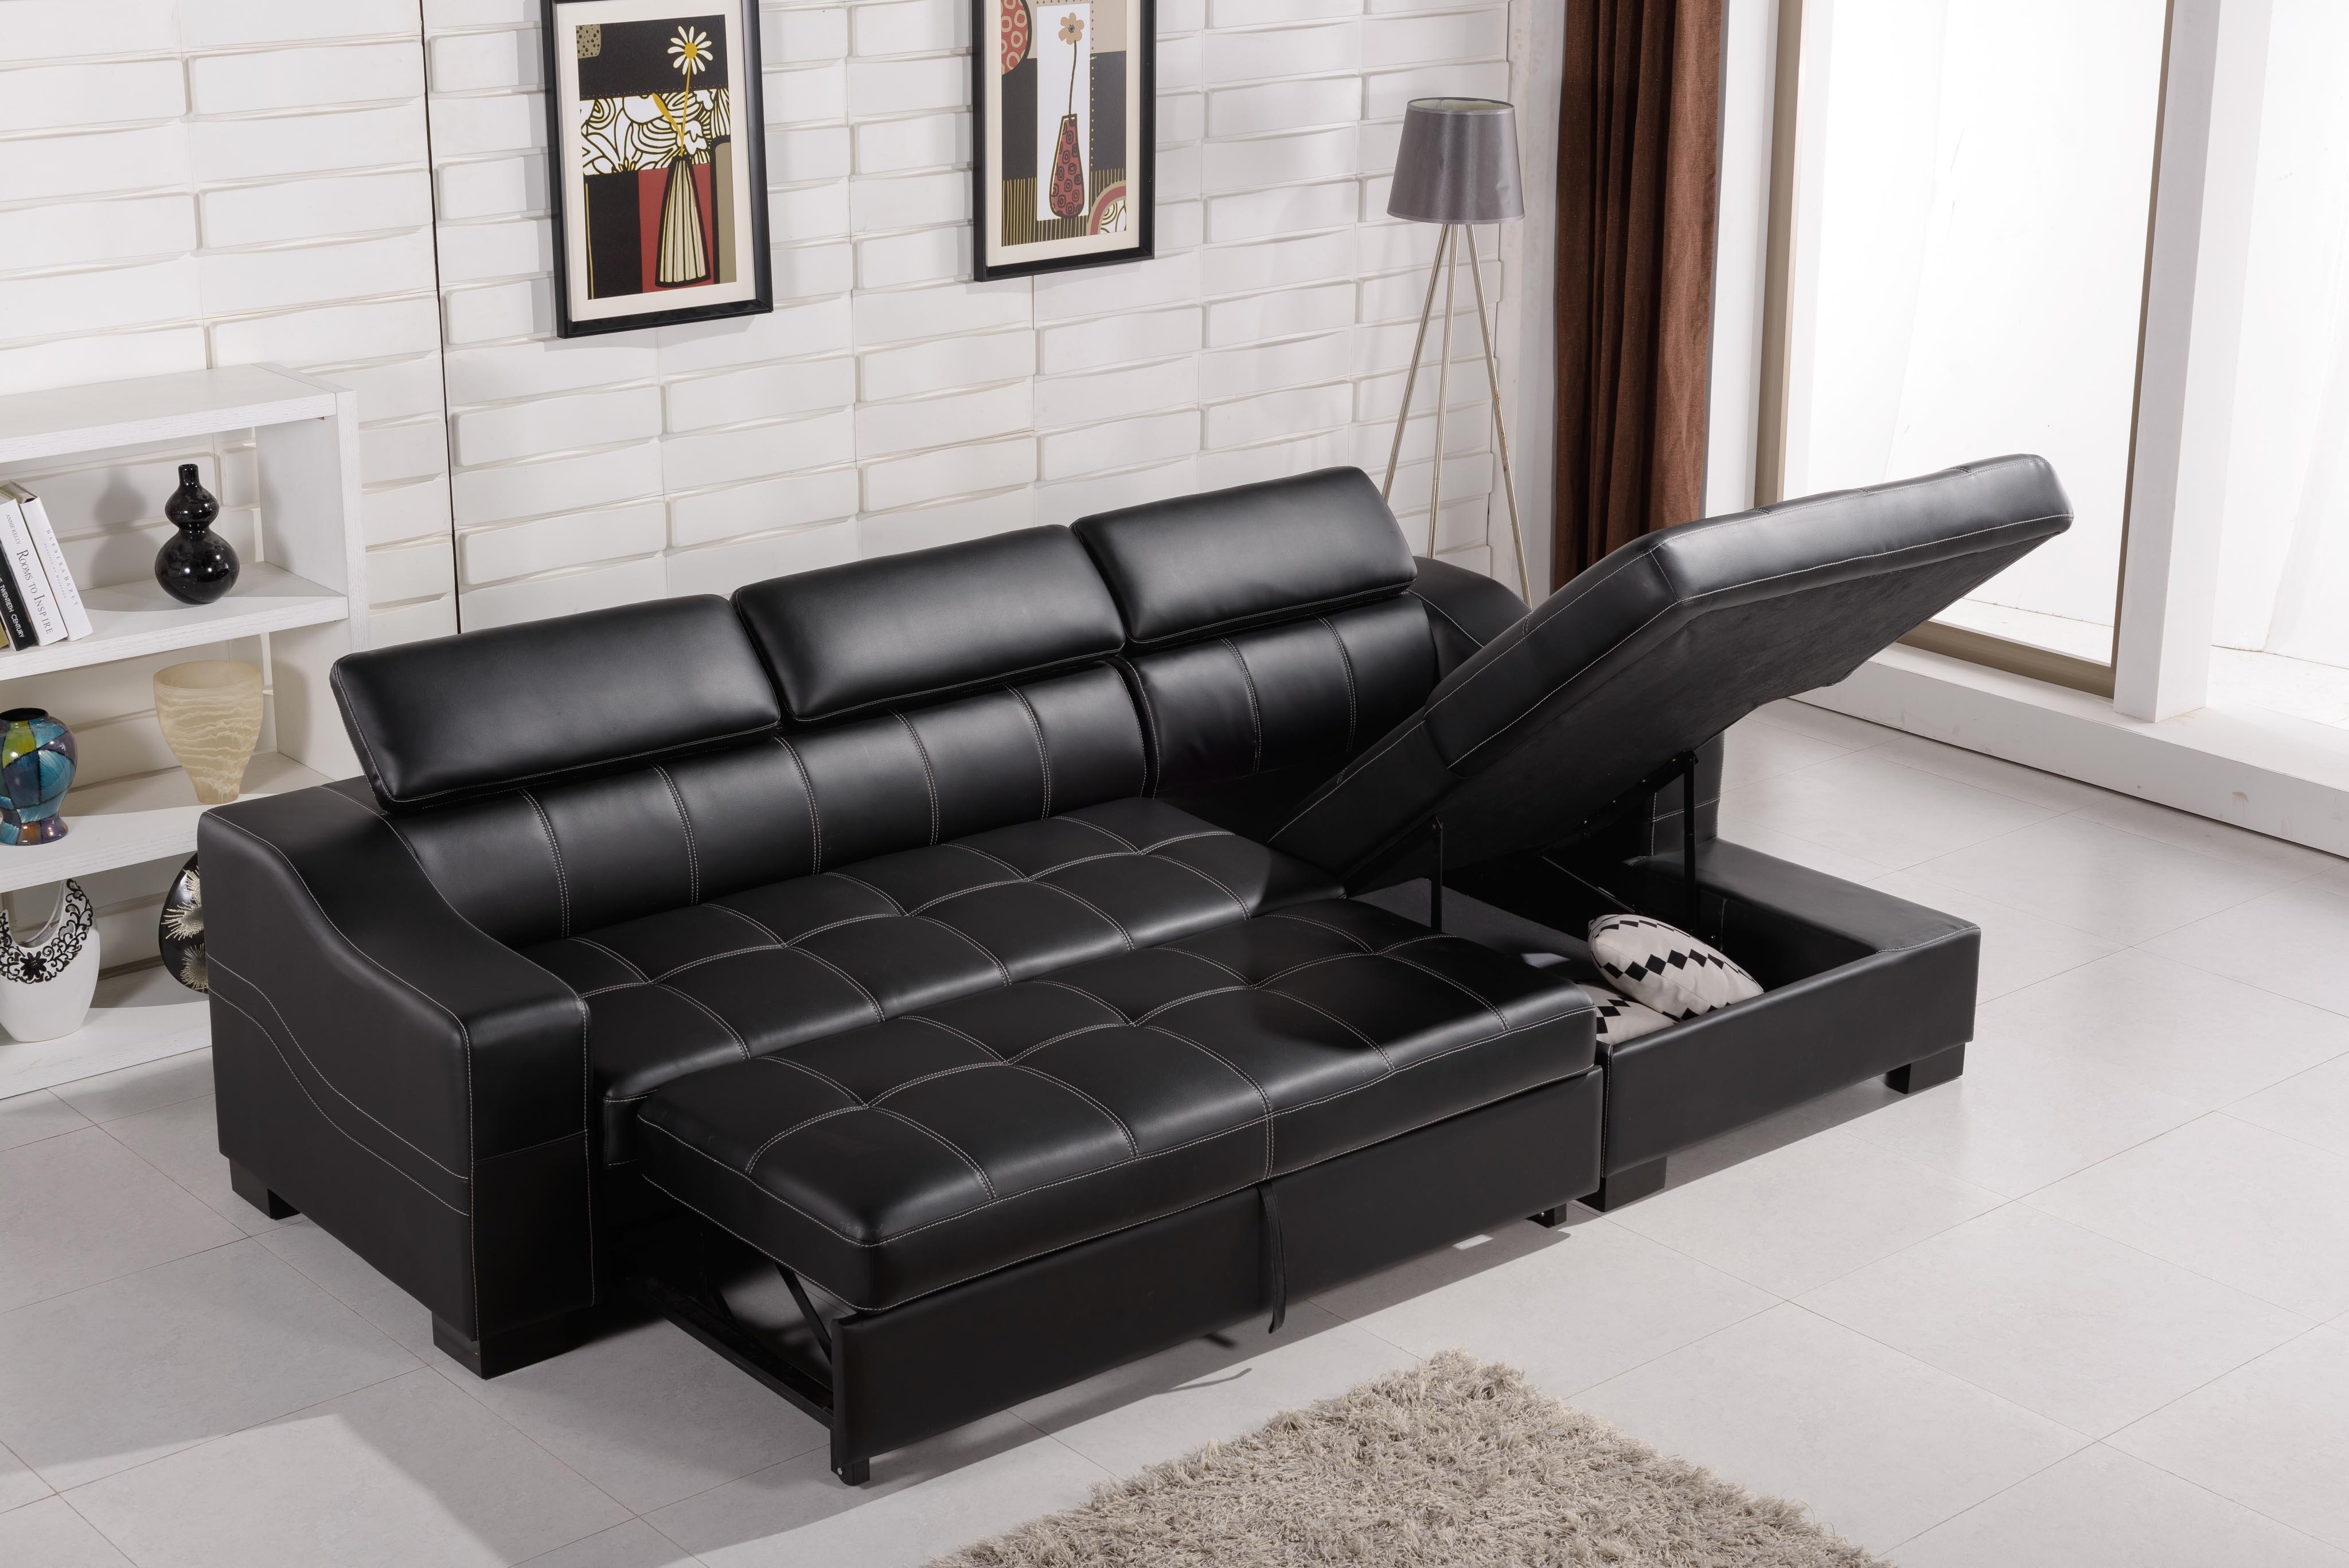 Wasserflecken Sofa Sofa Reinigen Erfahrungen Sofa Ideen Fesselnd Sofa